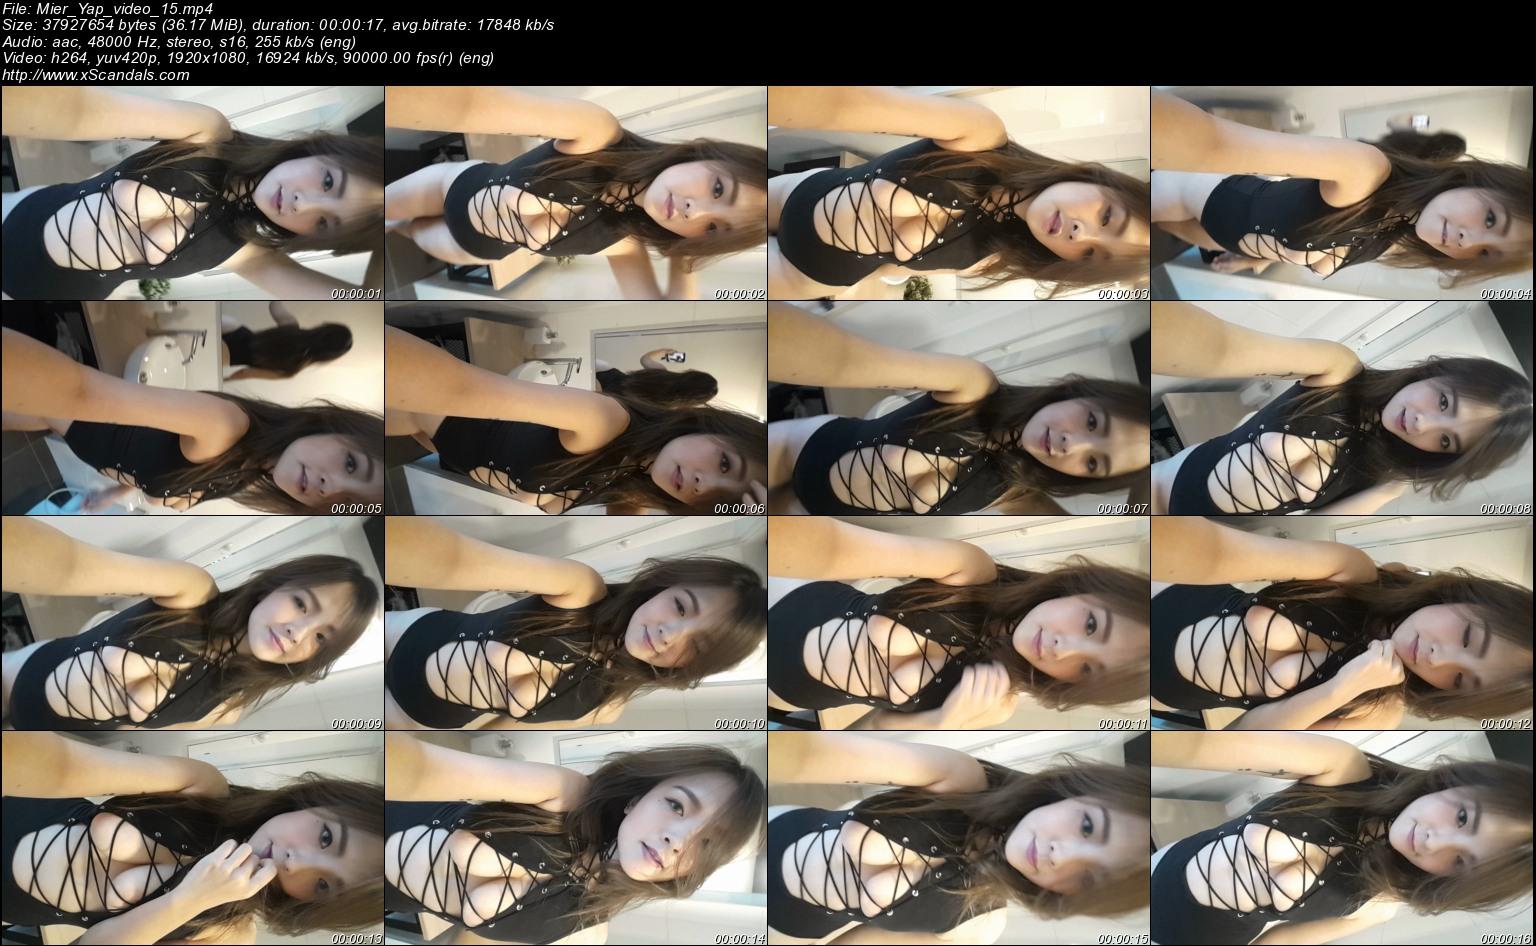 Mier_Yap_video_15.jpeg